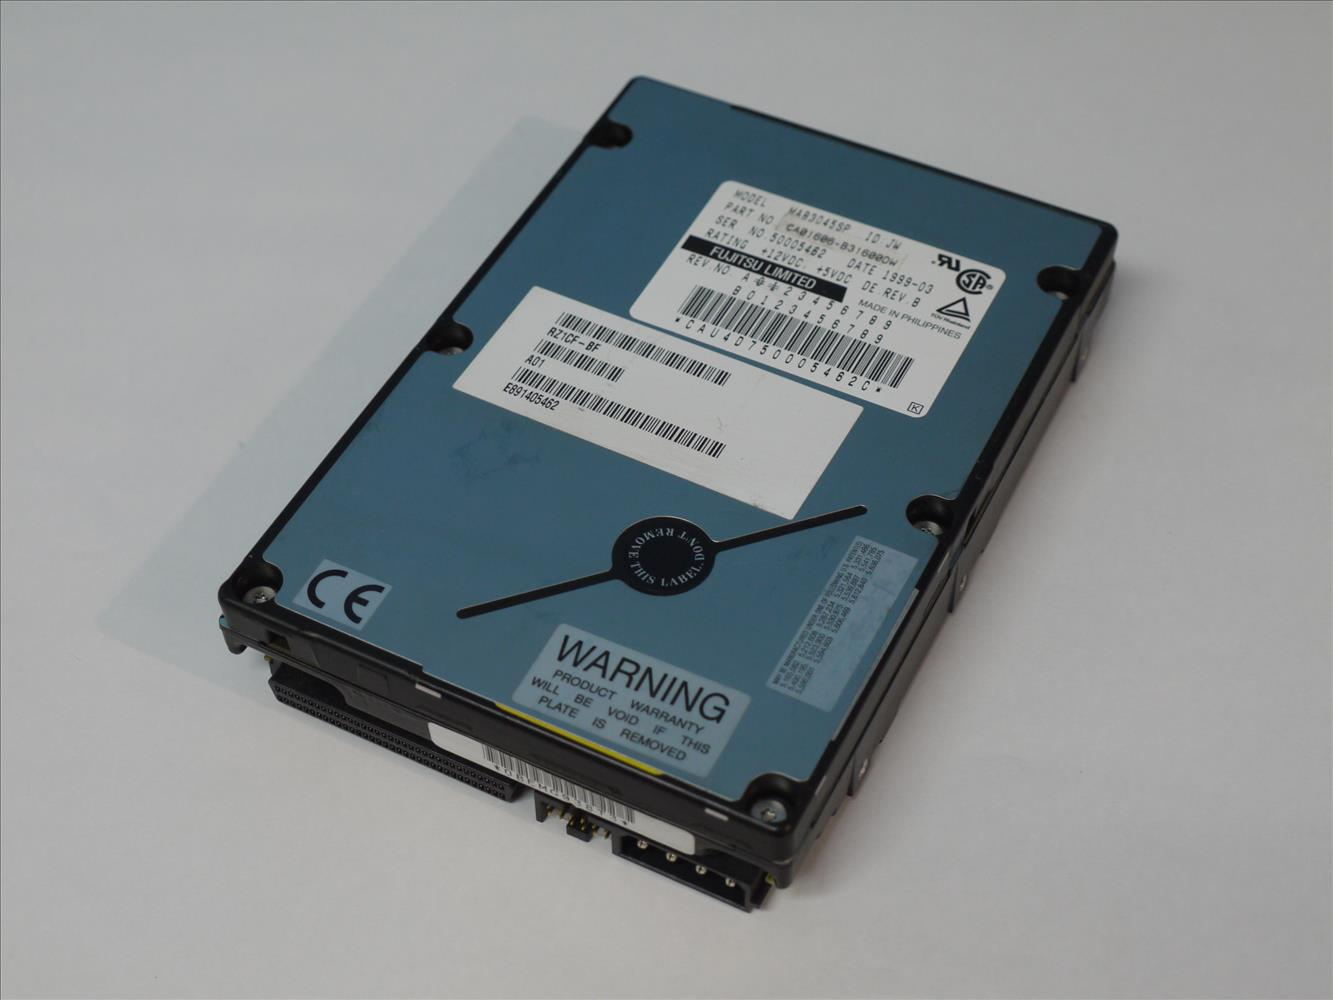 RZ1CF-BF COMPAQ / MAB3045SP FUJITSU 4.3GB 7200rpm 3.5インチ Ultra2 Wide SCSI 68-Pin 【中古】【送料無料セール中! (大型商品は対象外)】